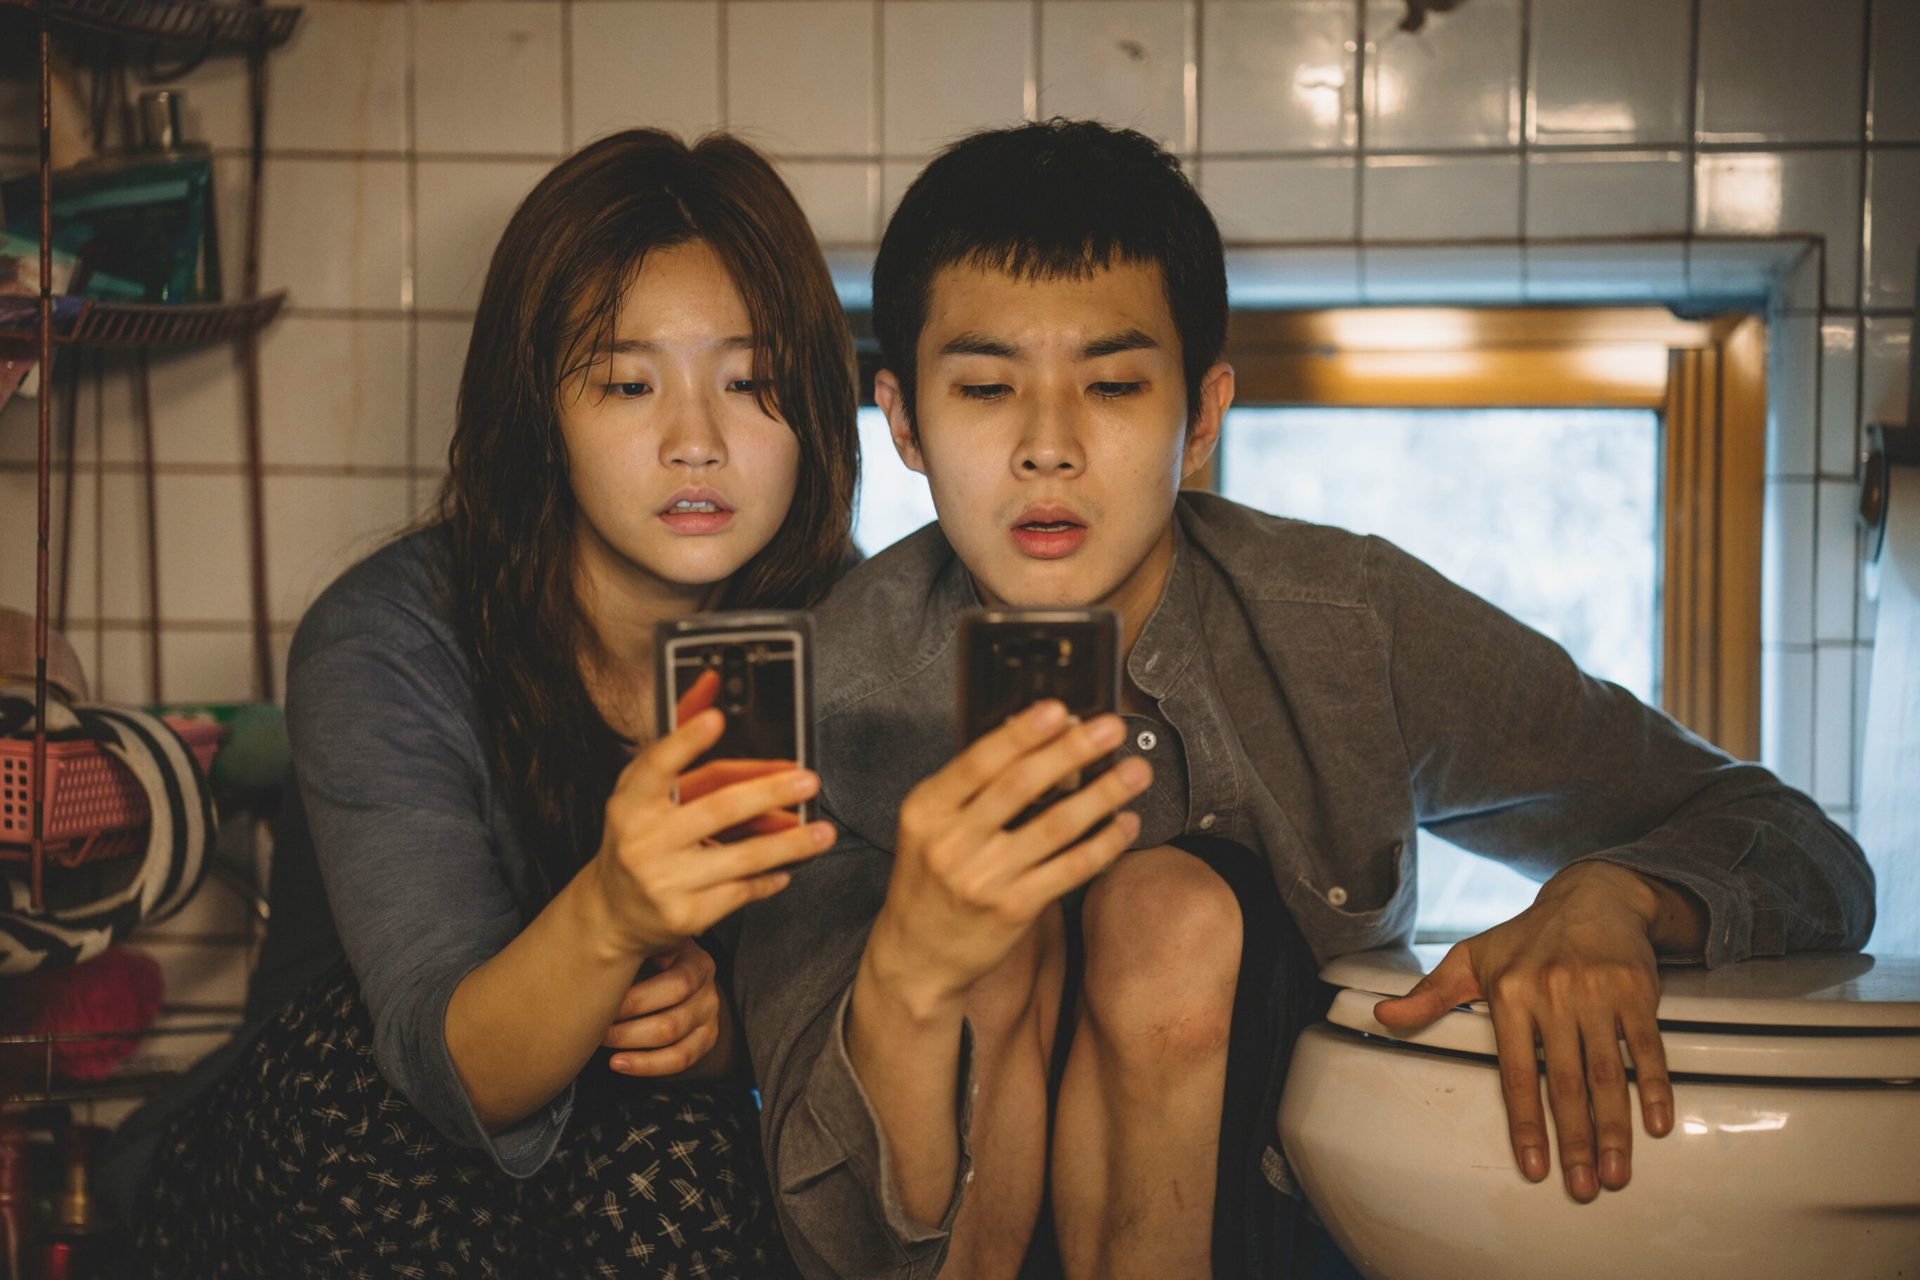 Gisaengchung - Parasitas, do realizador coreano Bong Joon-ho. Drama, M/14, Coreia do Sul, 2019. Palma de Ouro no Festival de Cannes.